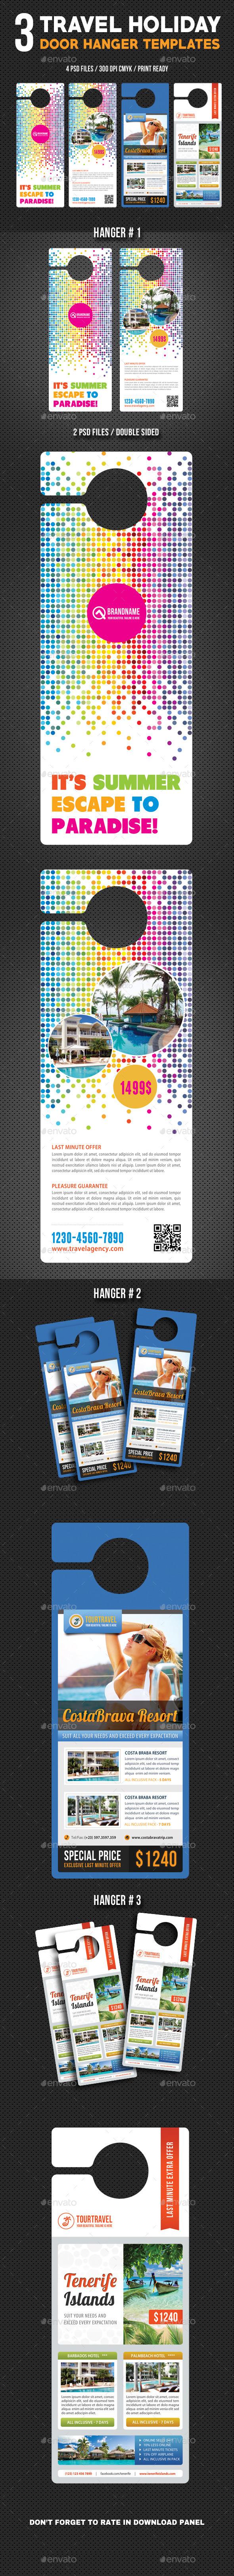 3 Travel Holiday Door Hanger Bundle 01 - Miscellaneous Print Templates